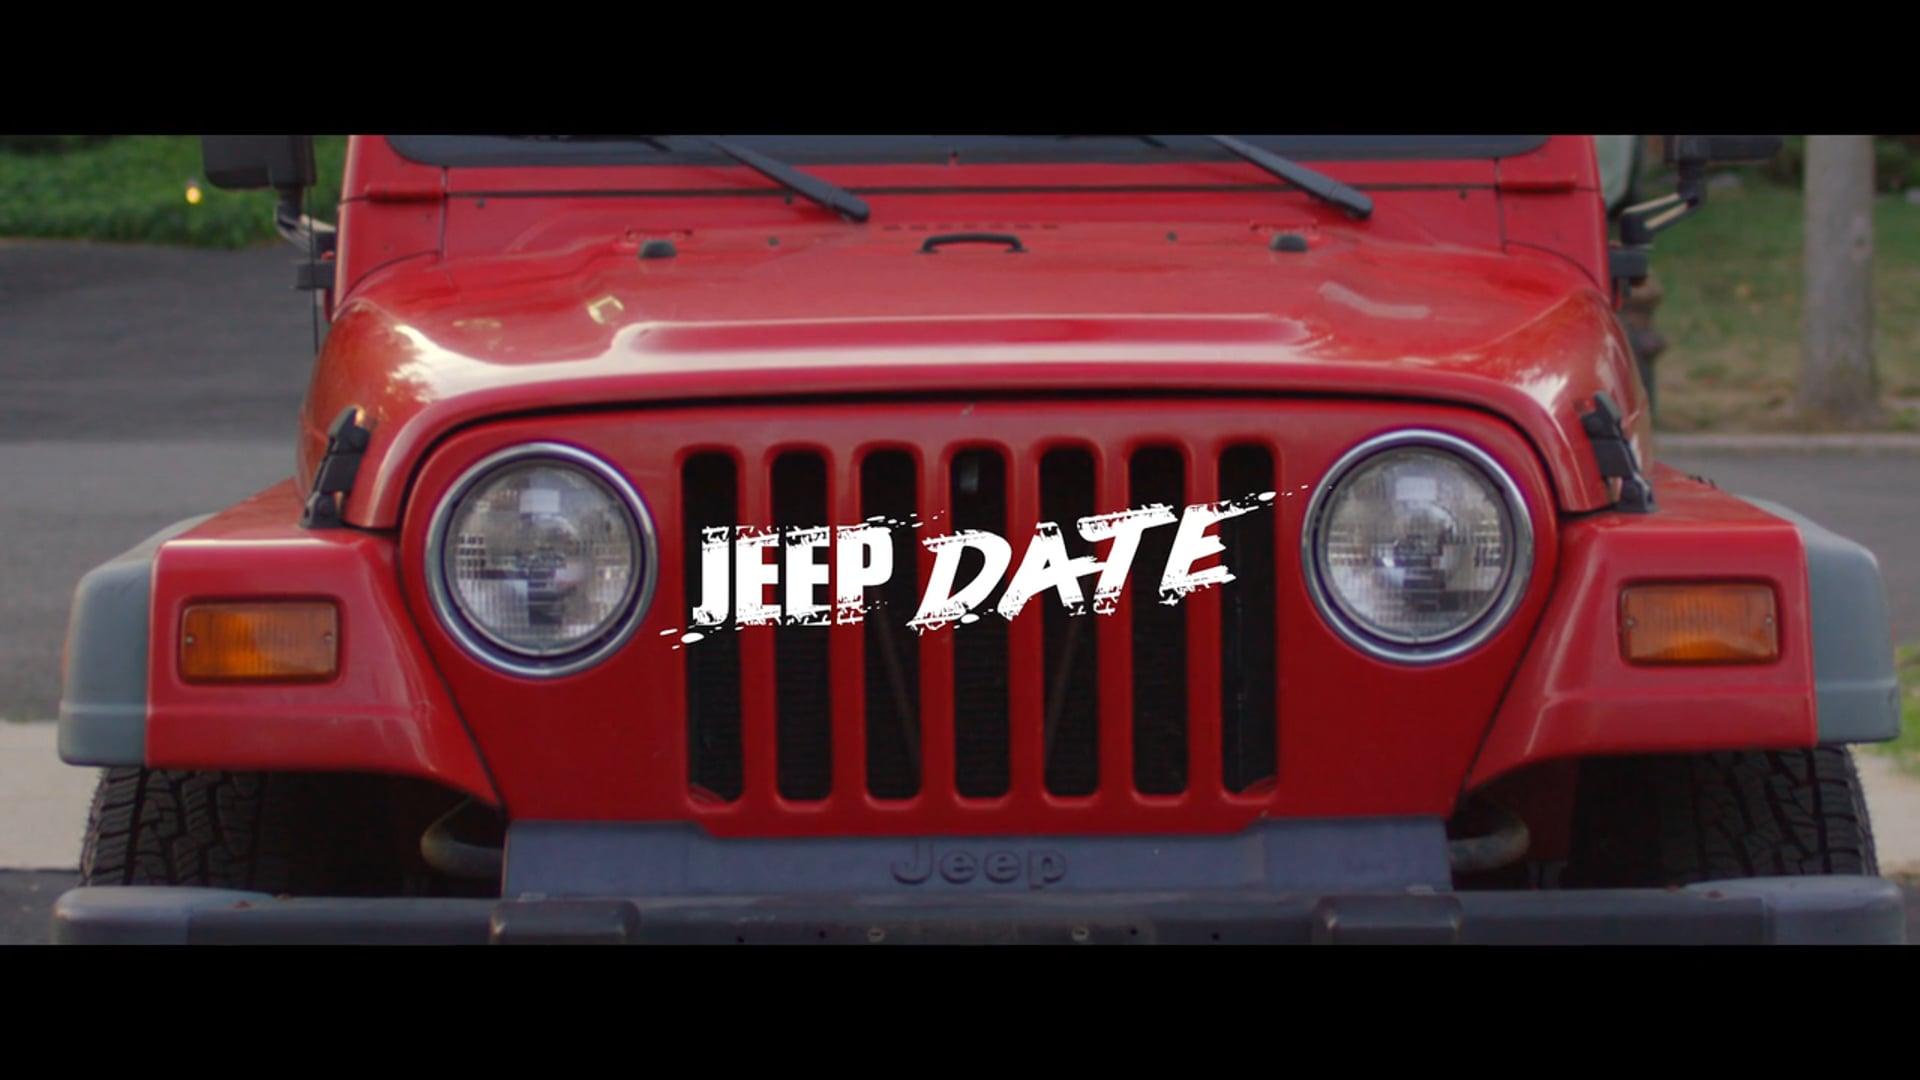 JEEP DATE